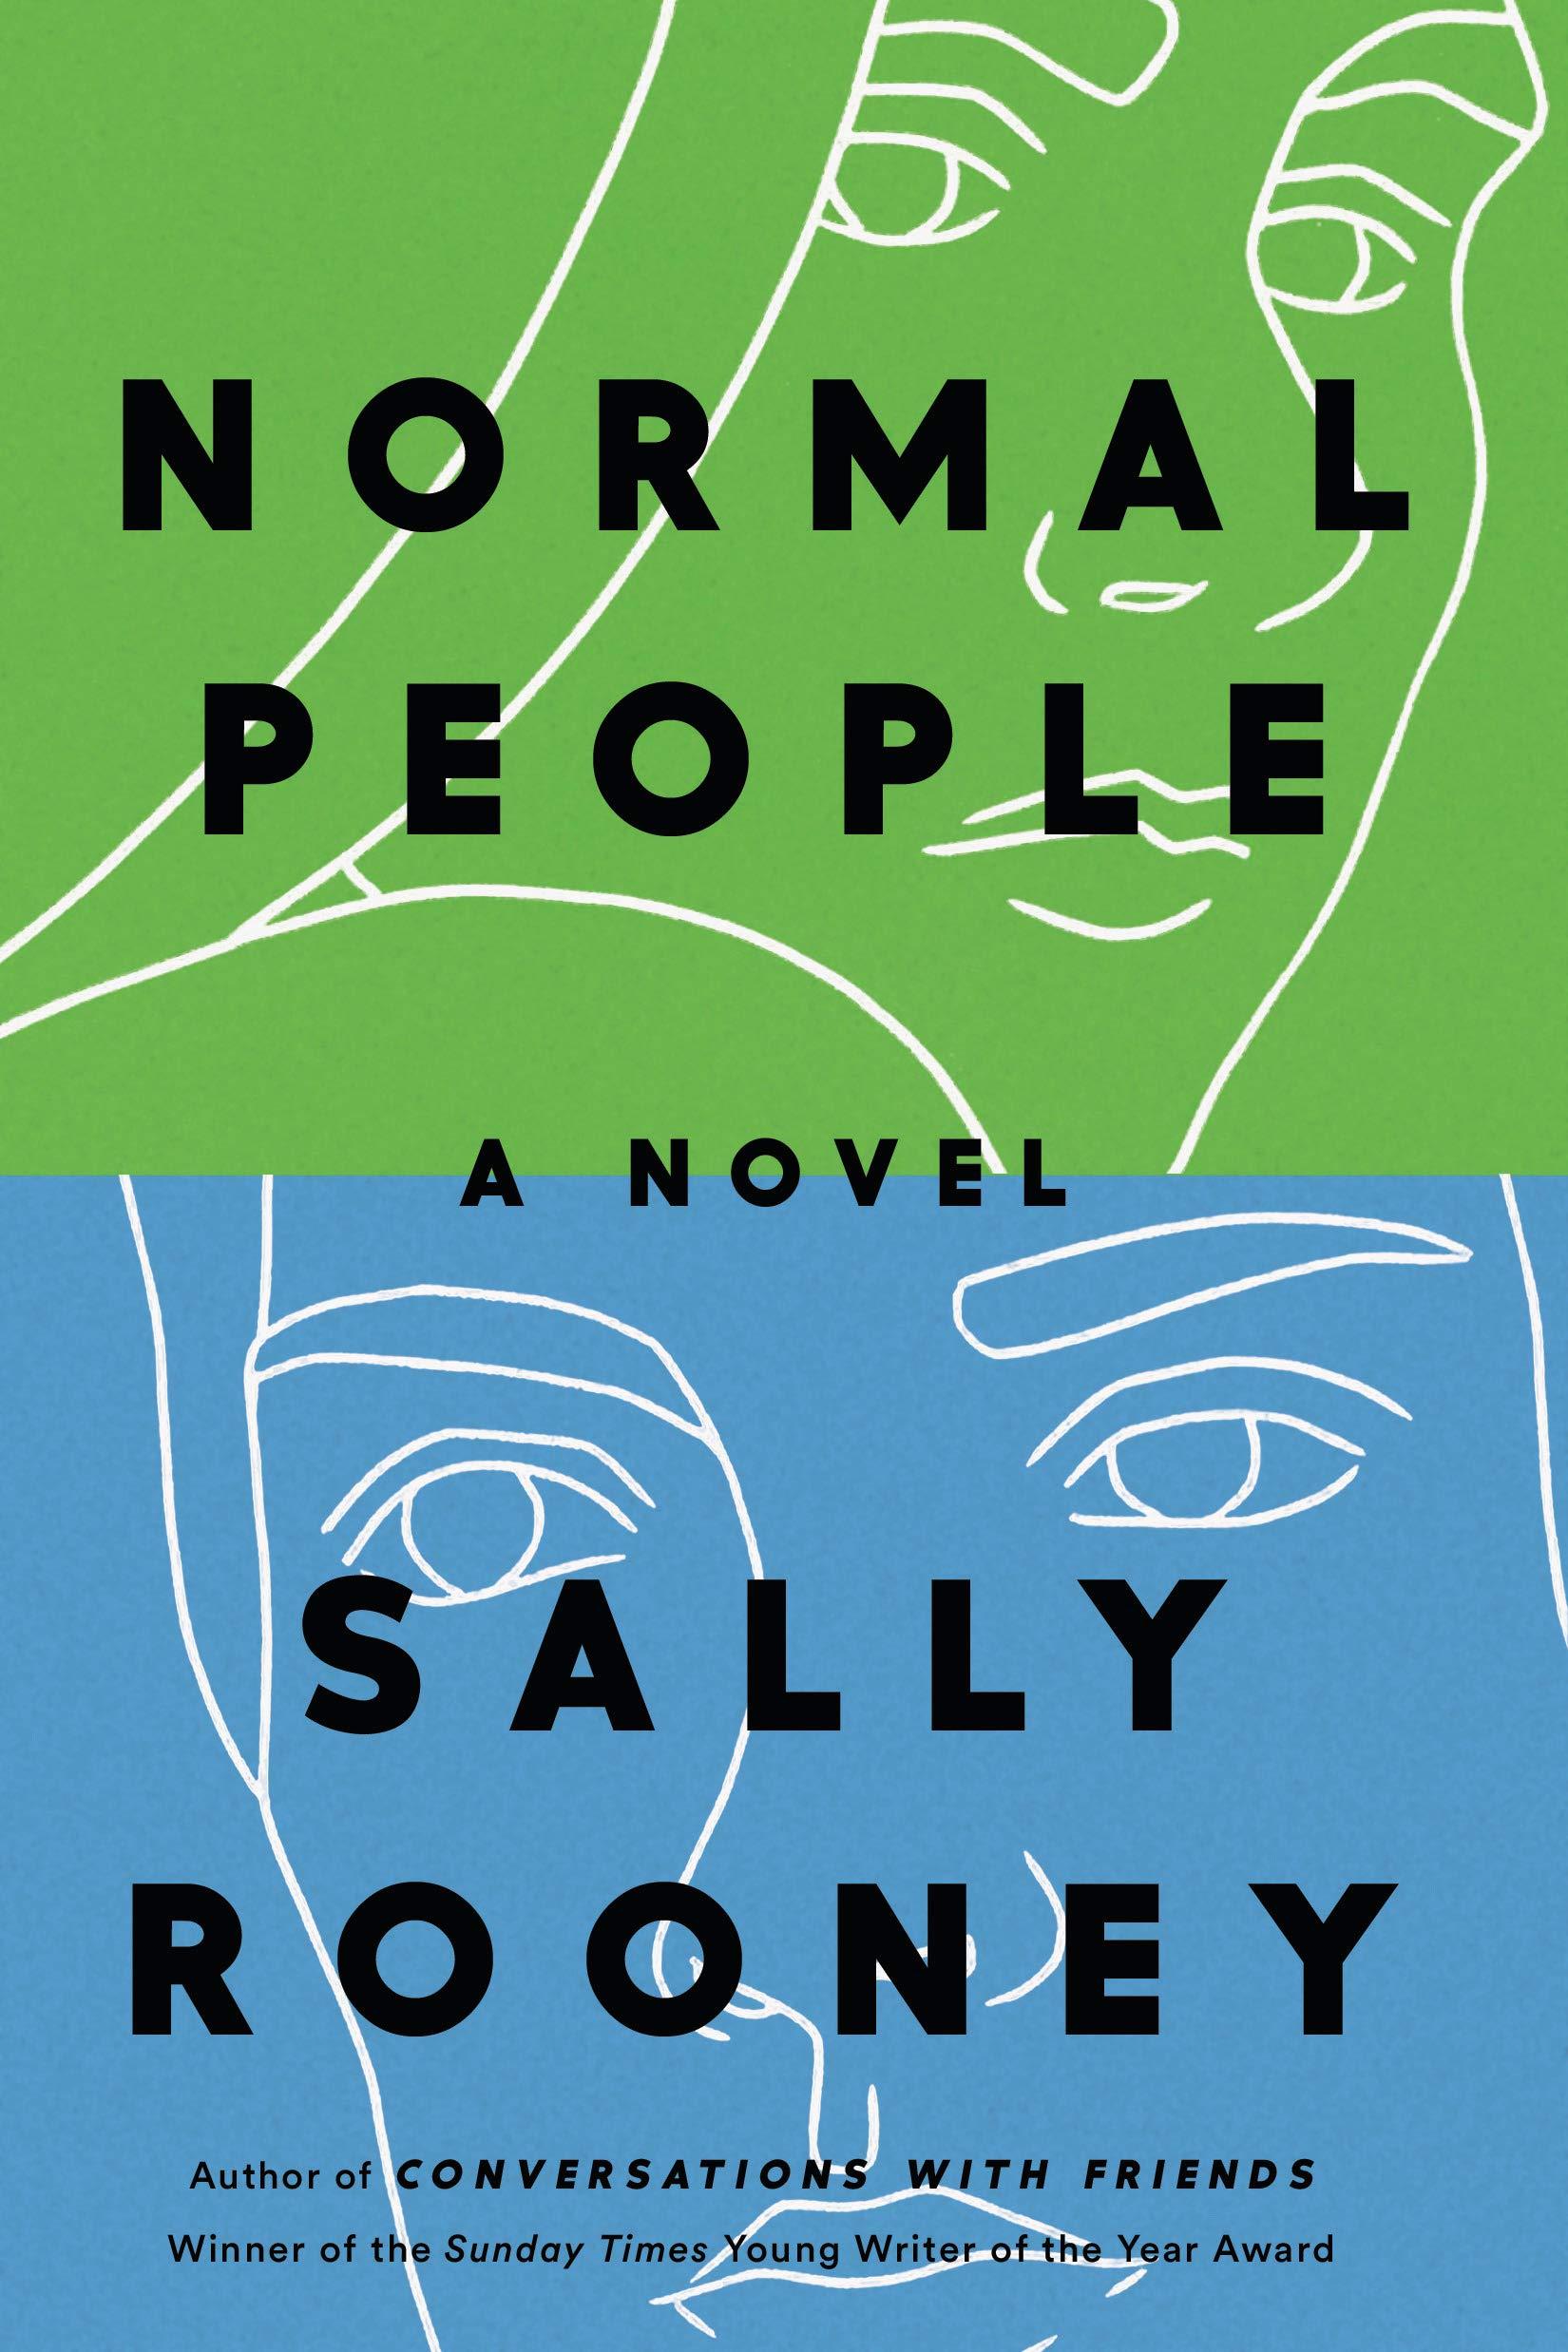 Normal People Book Cover.jpg